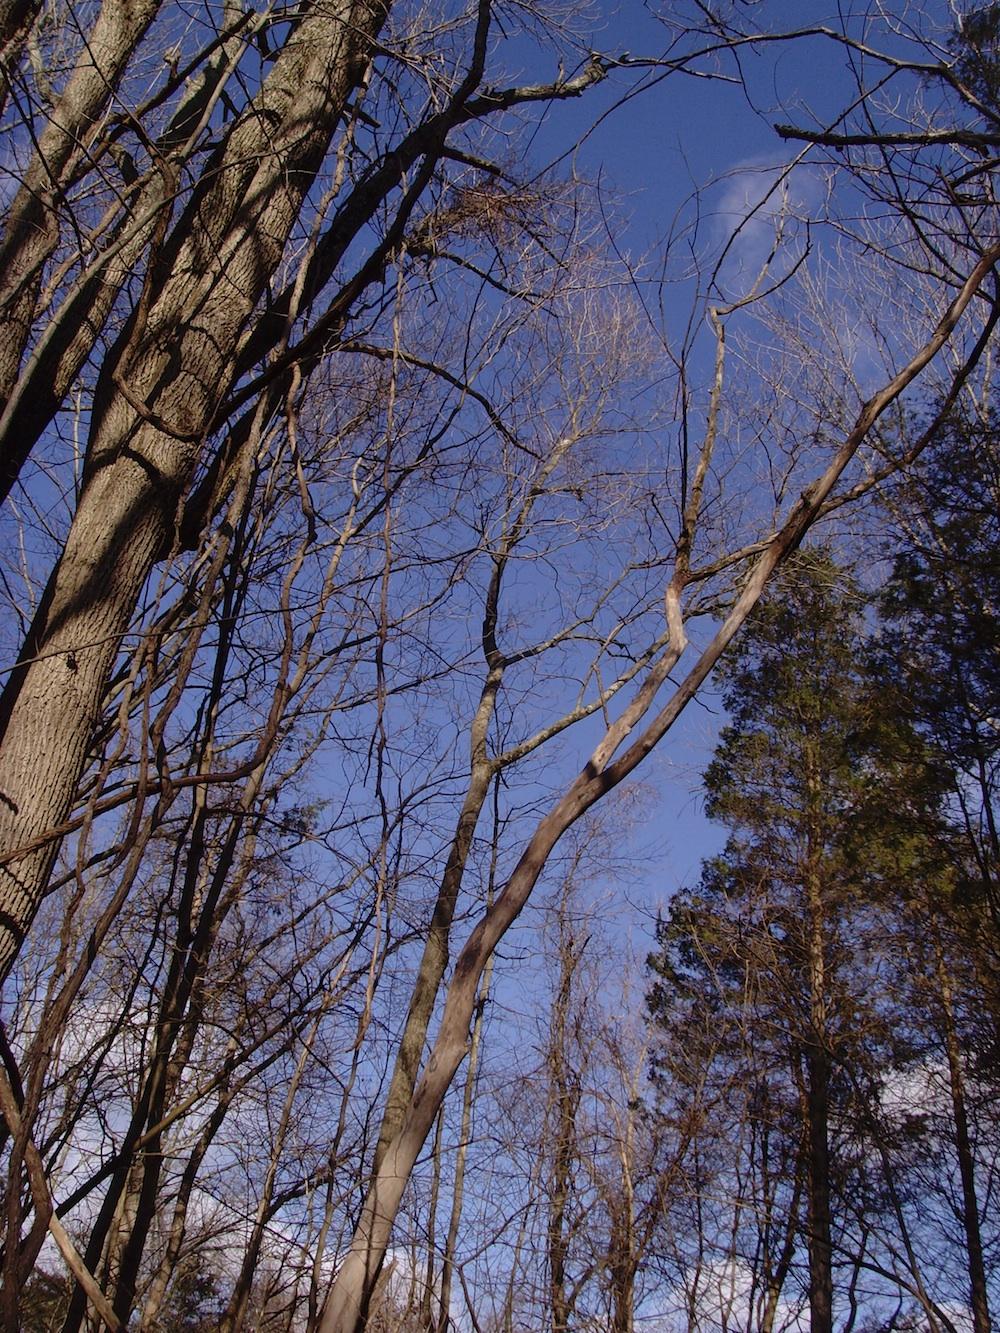 Bare treetops